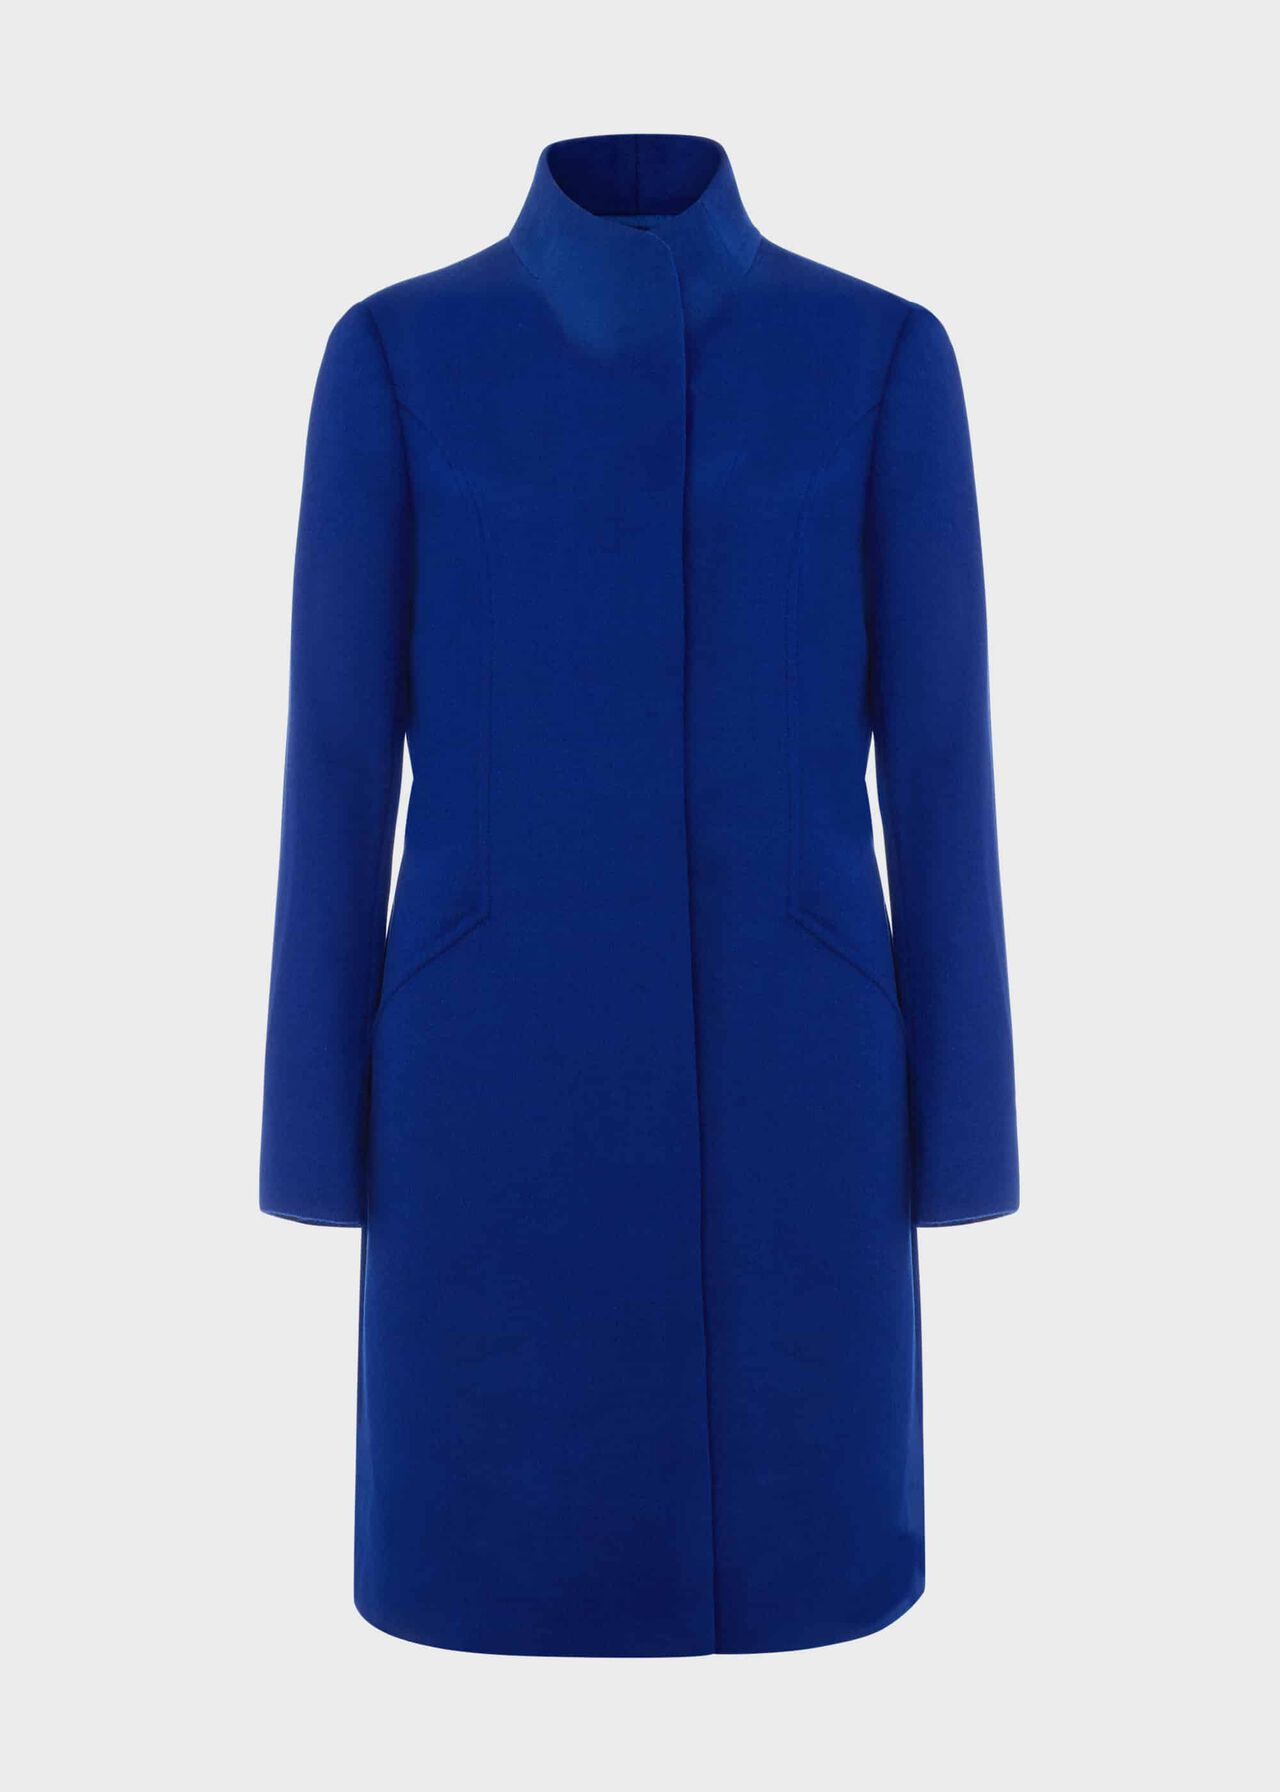 Mandy Wool Coat Cobalt